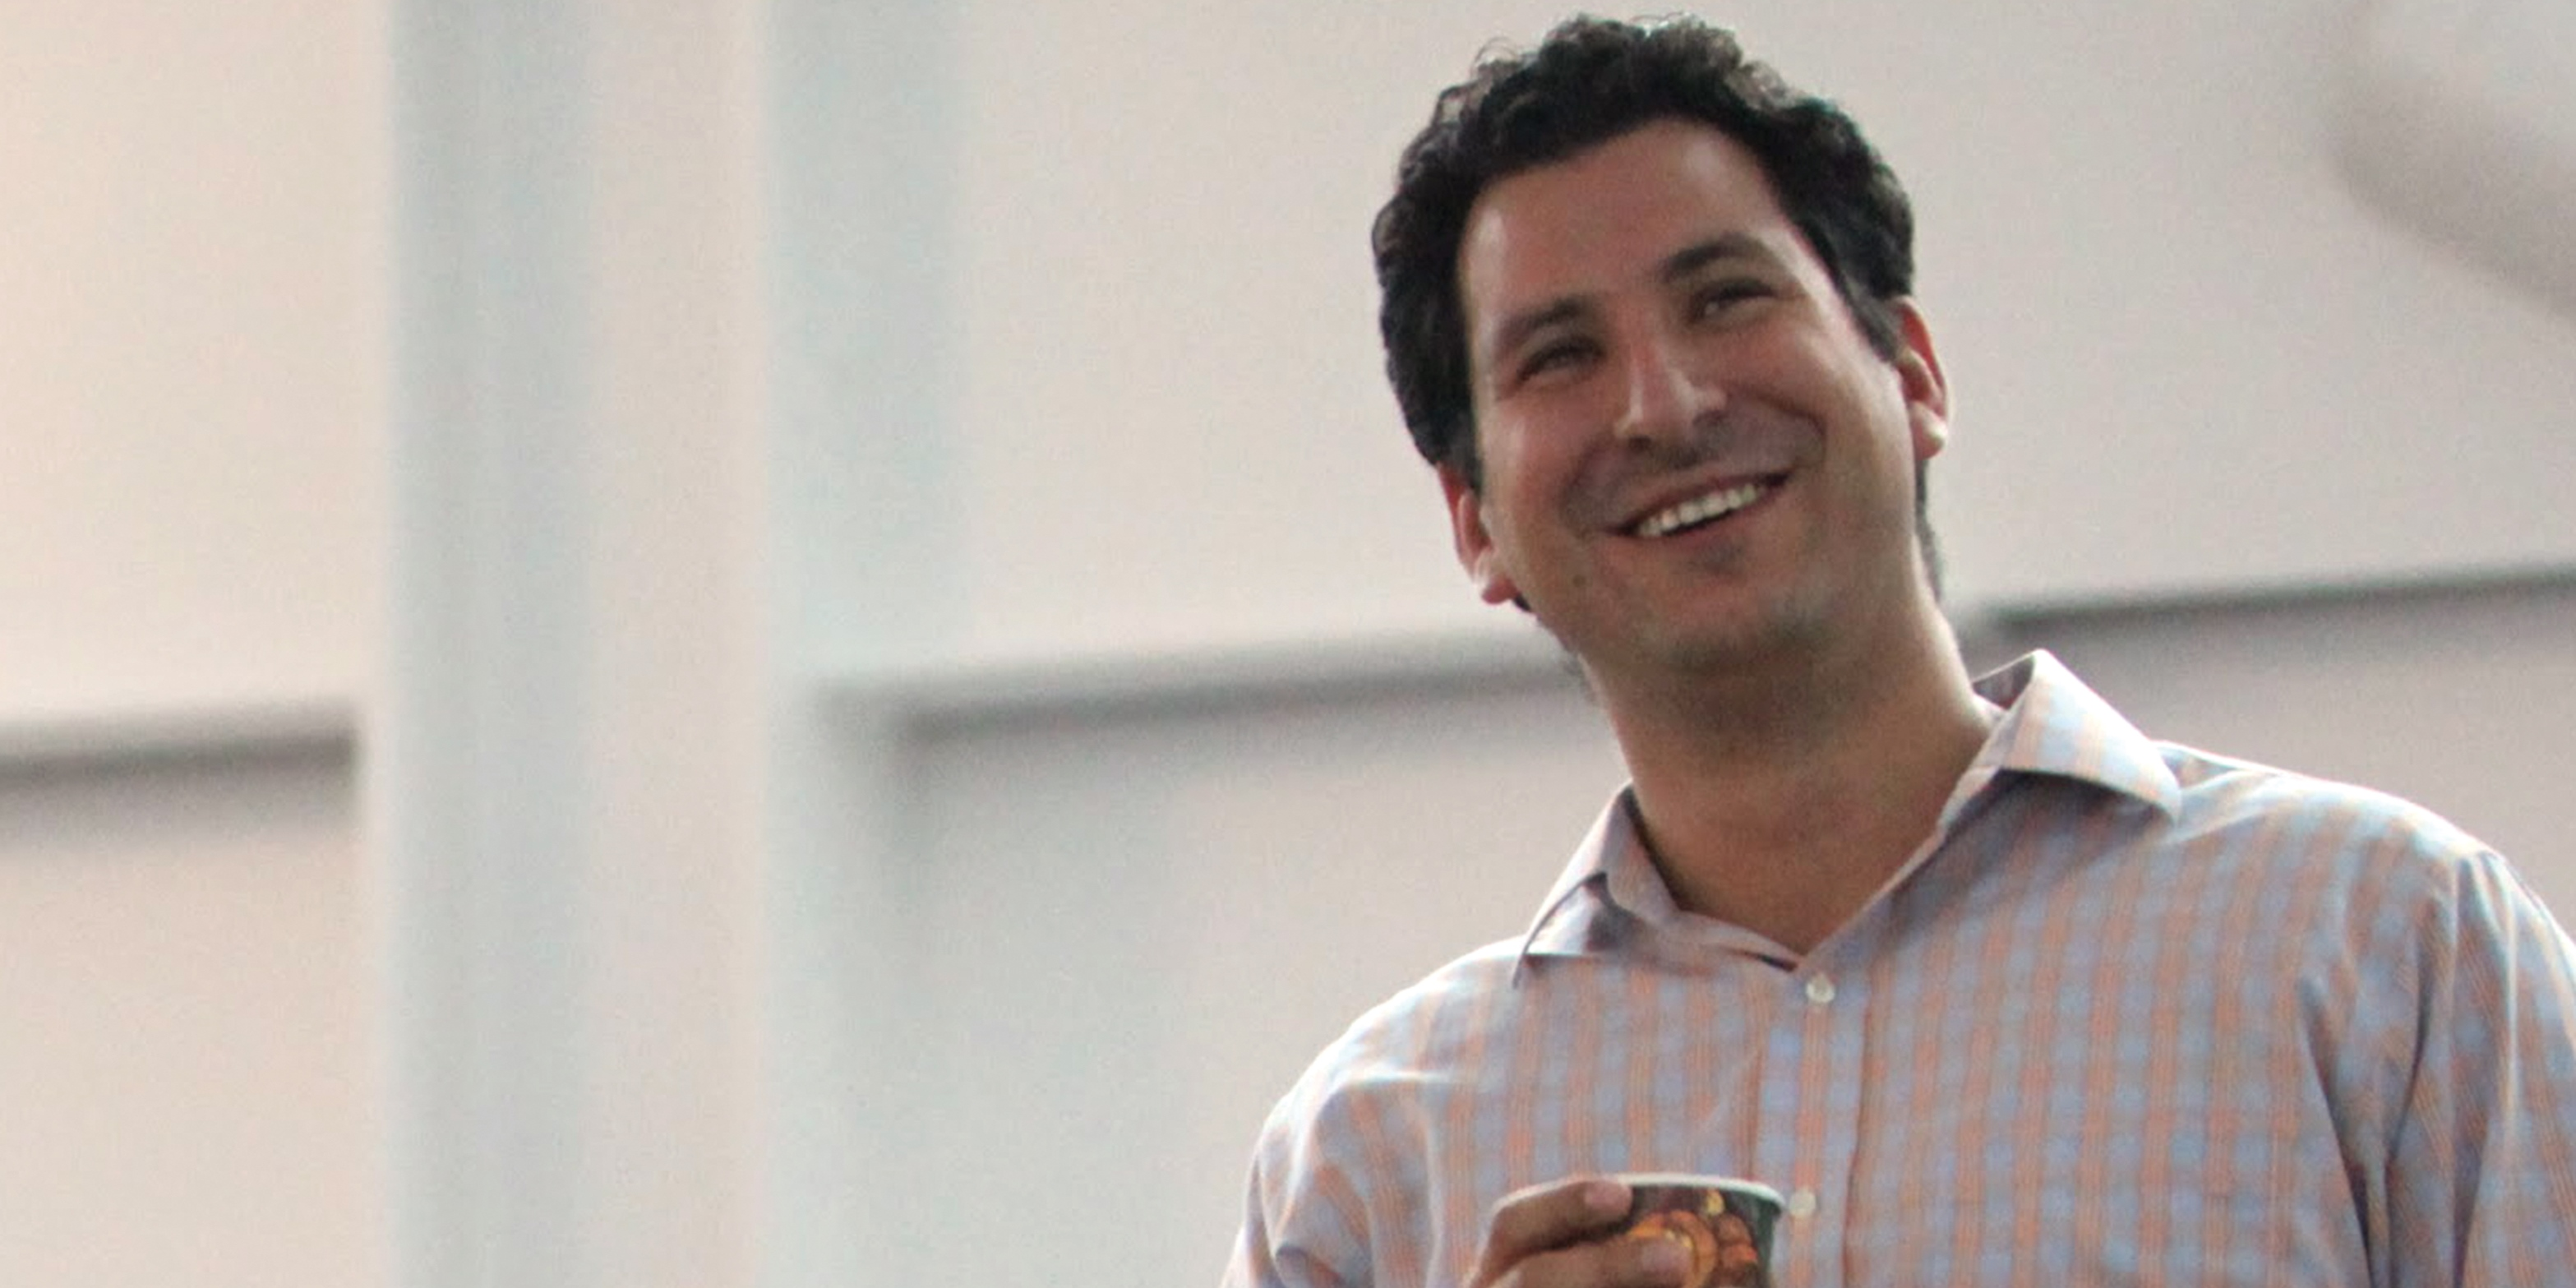 Noam Weissman - Former Principal, Shalhevet High School